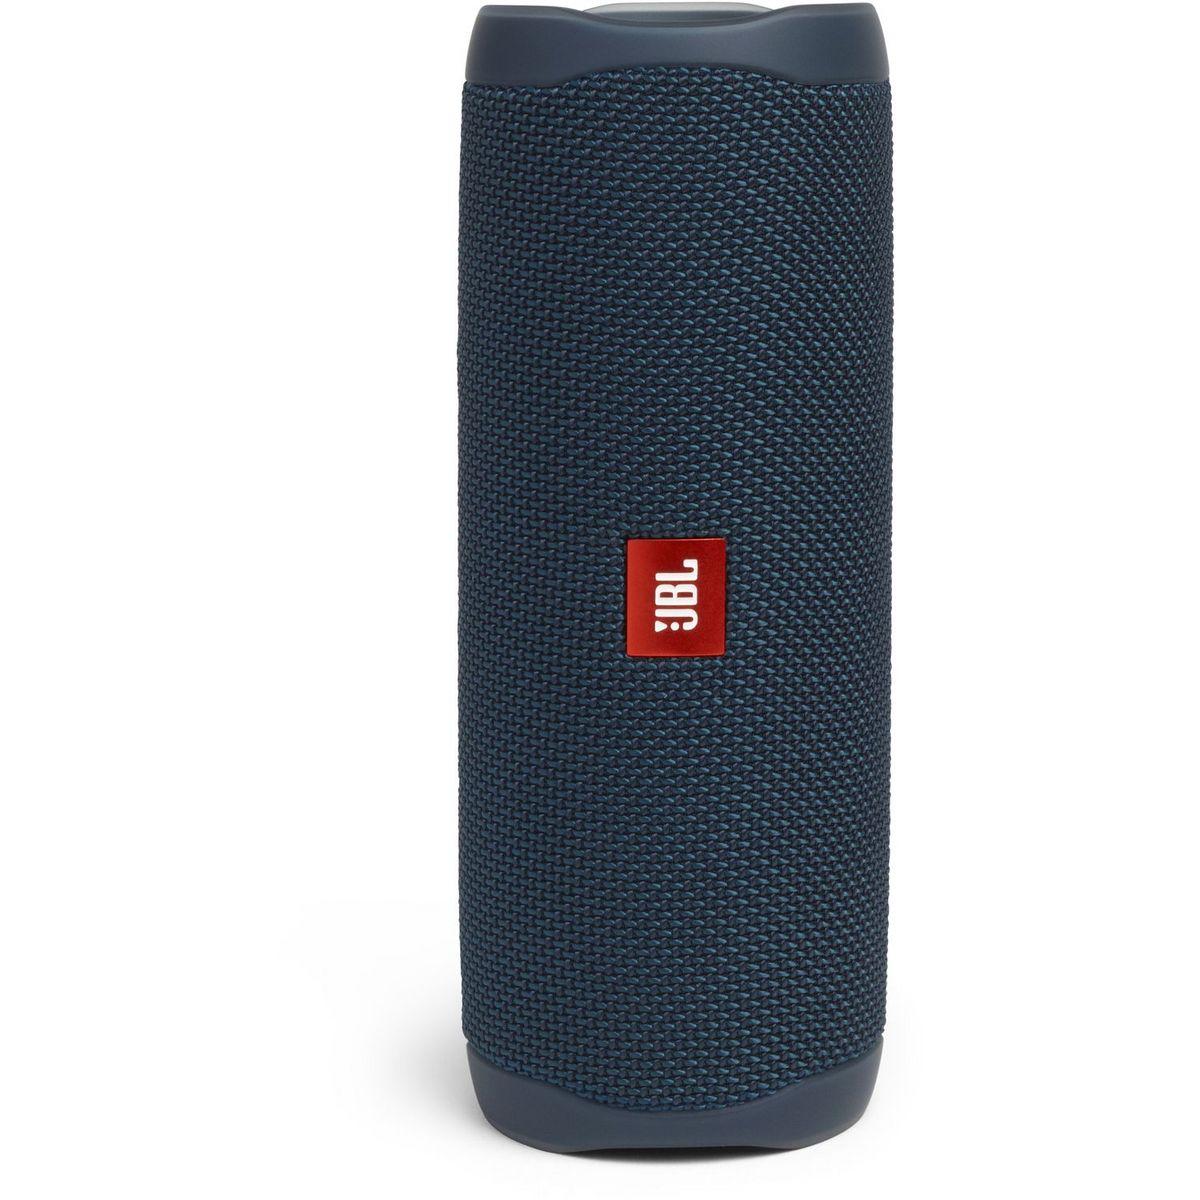 Enceinte portable Bluetooth - Bleu - Flip 5